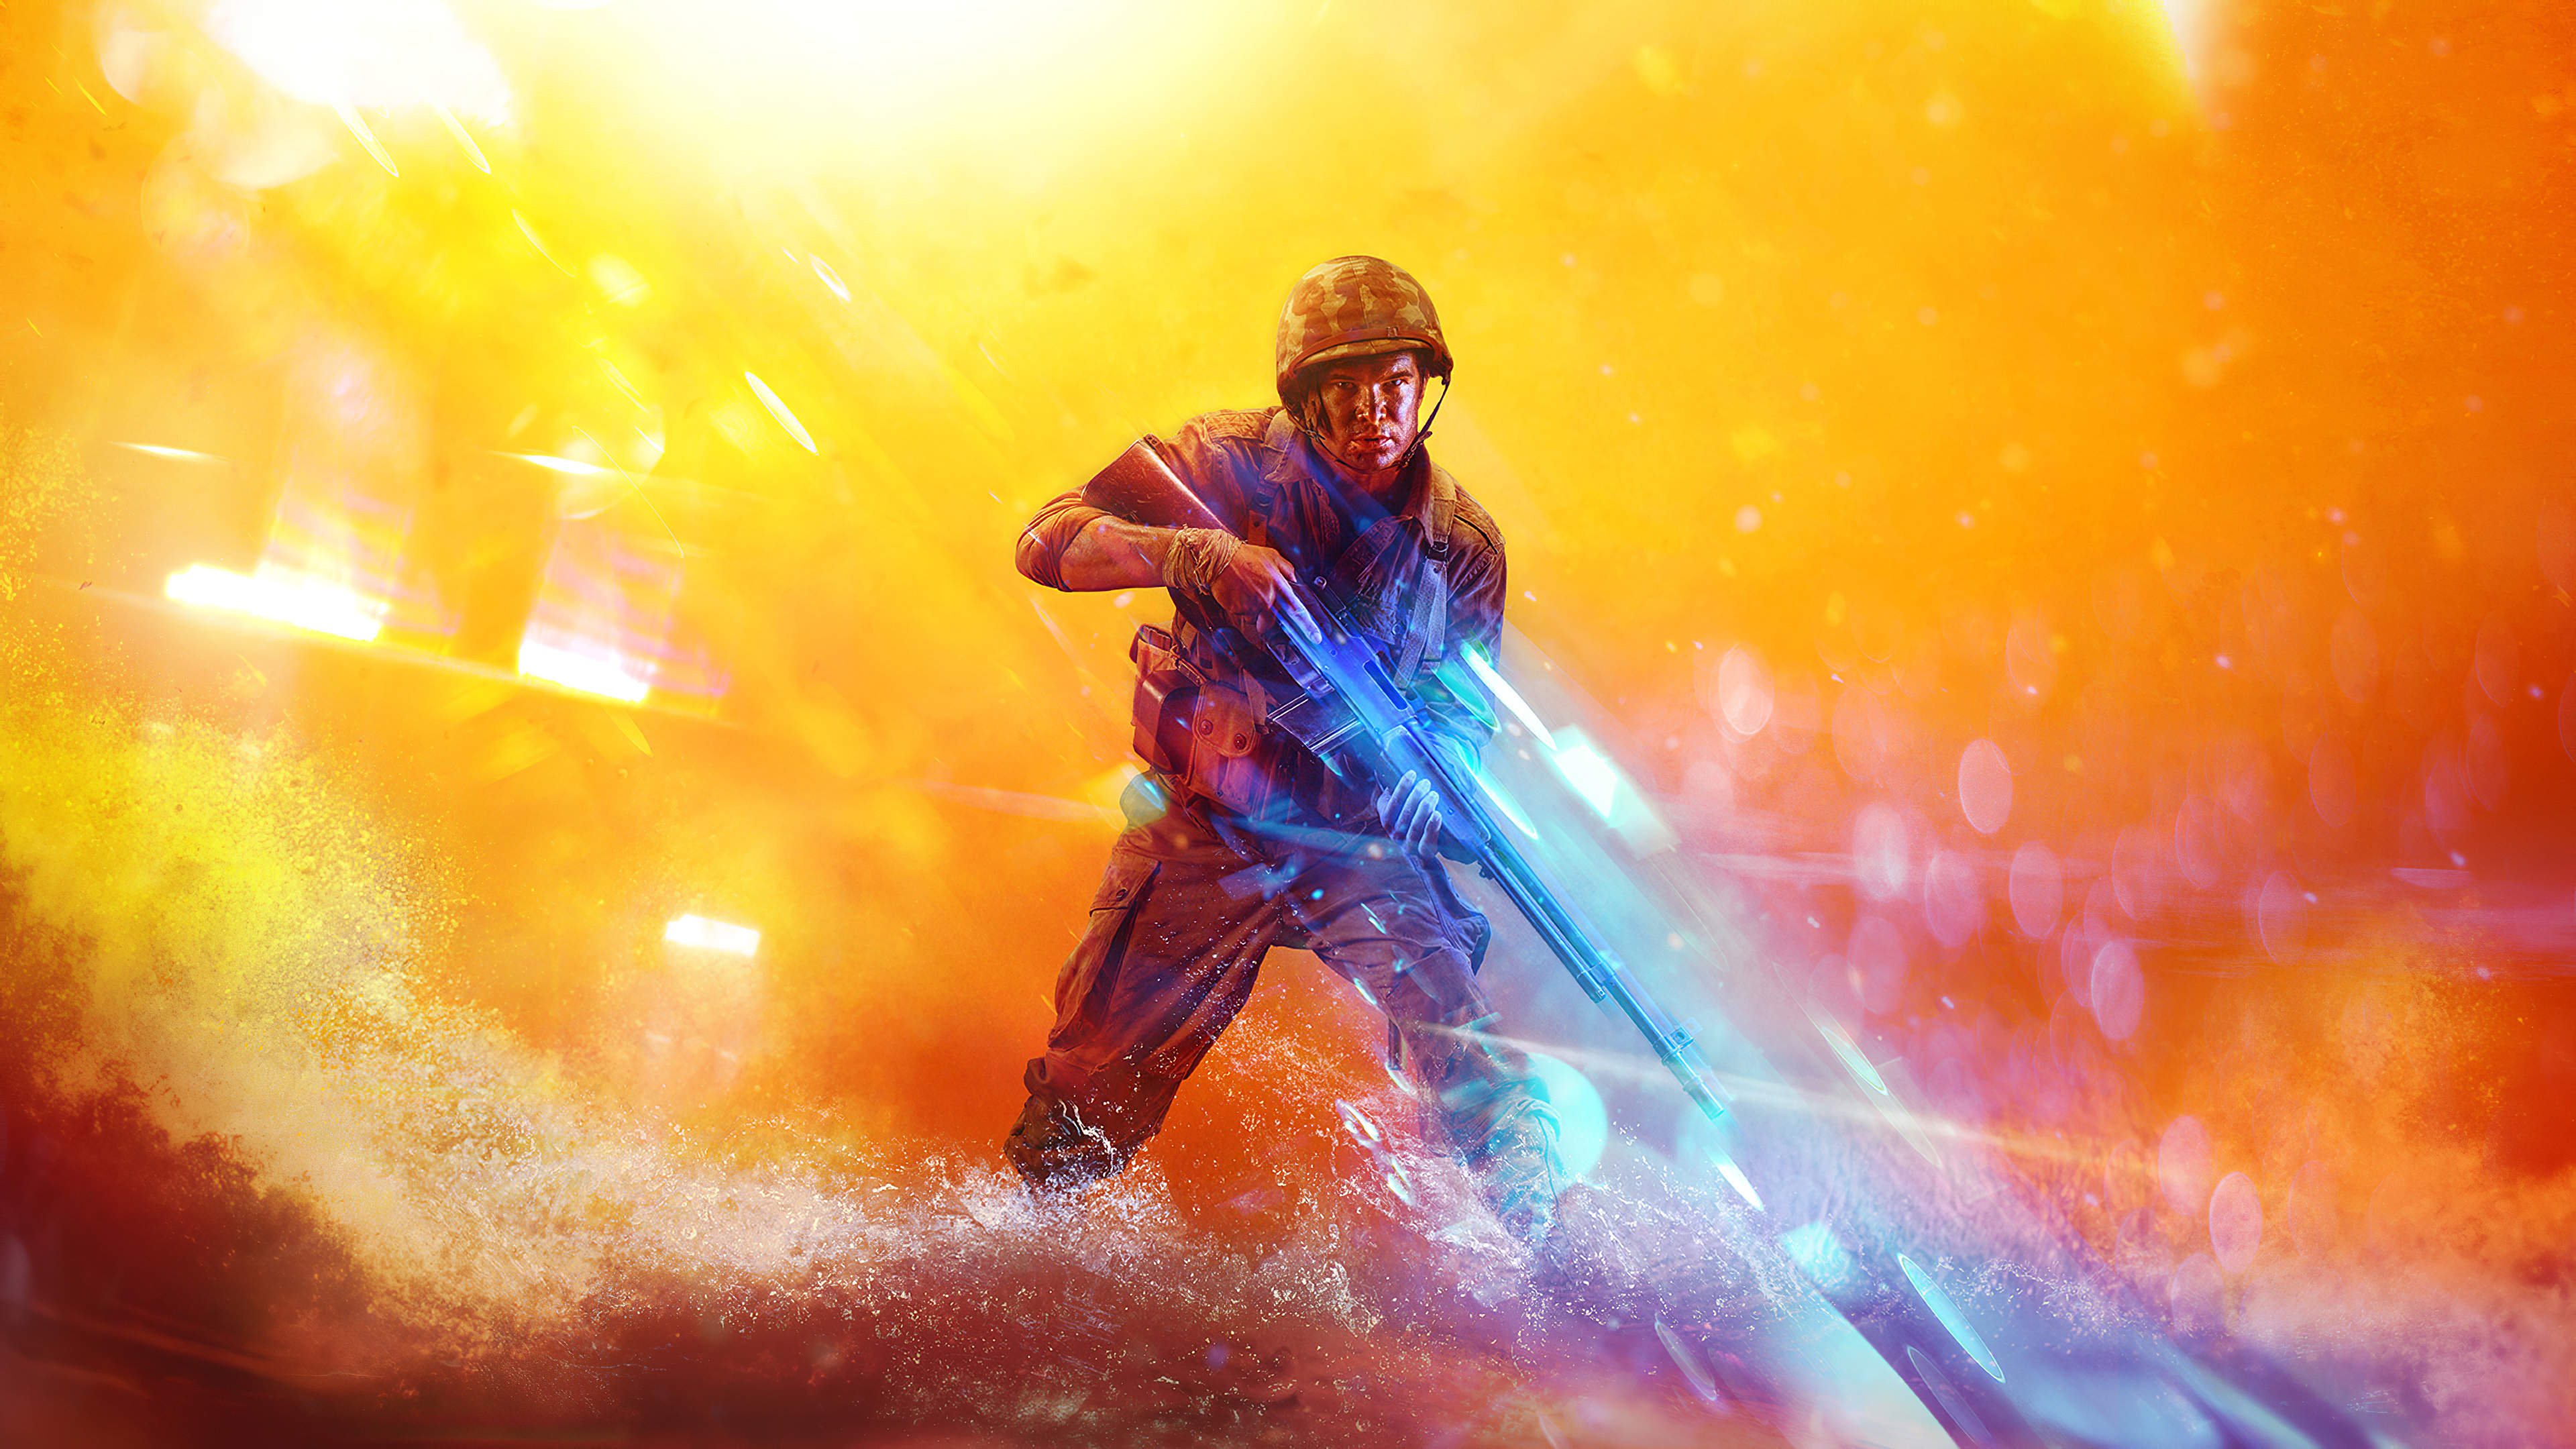 4k Battlefield 5 2019 Wallpaper Hd Games 4k Wallpapers